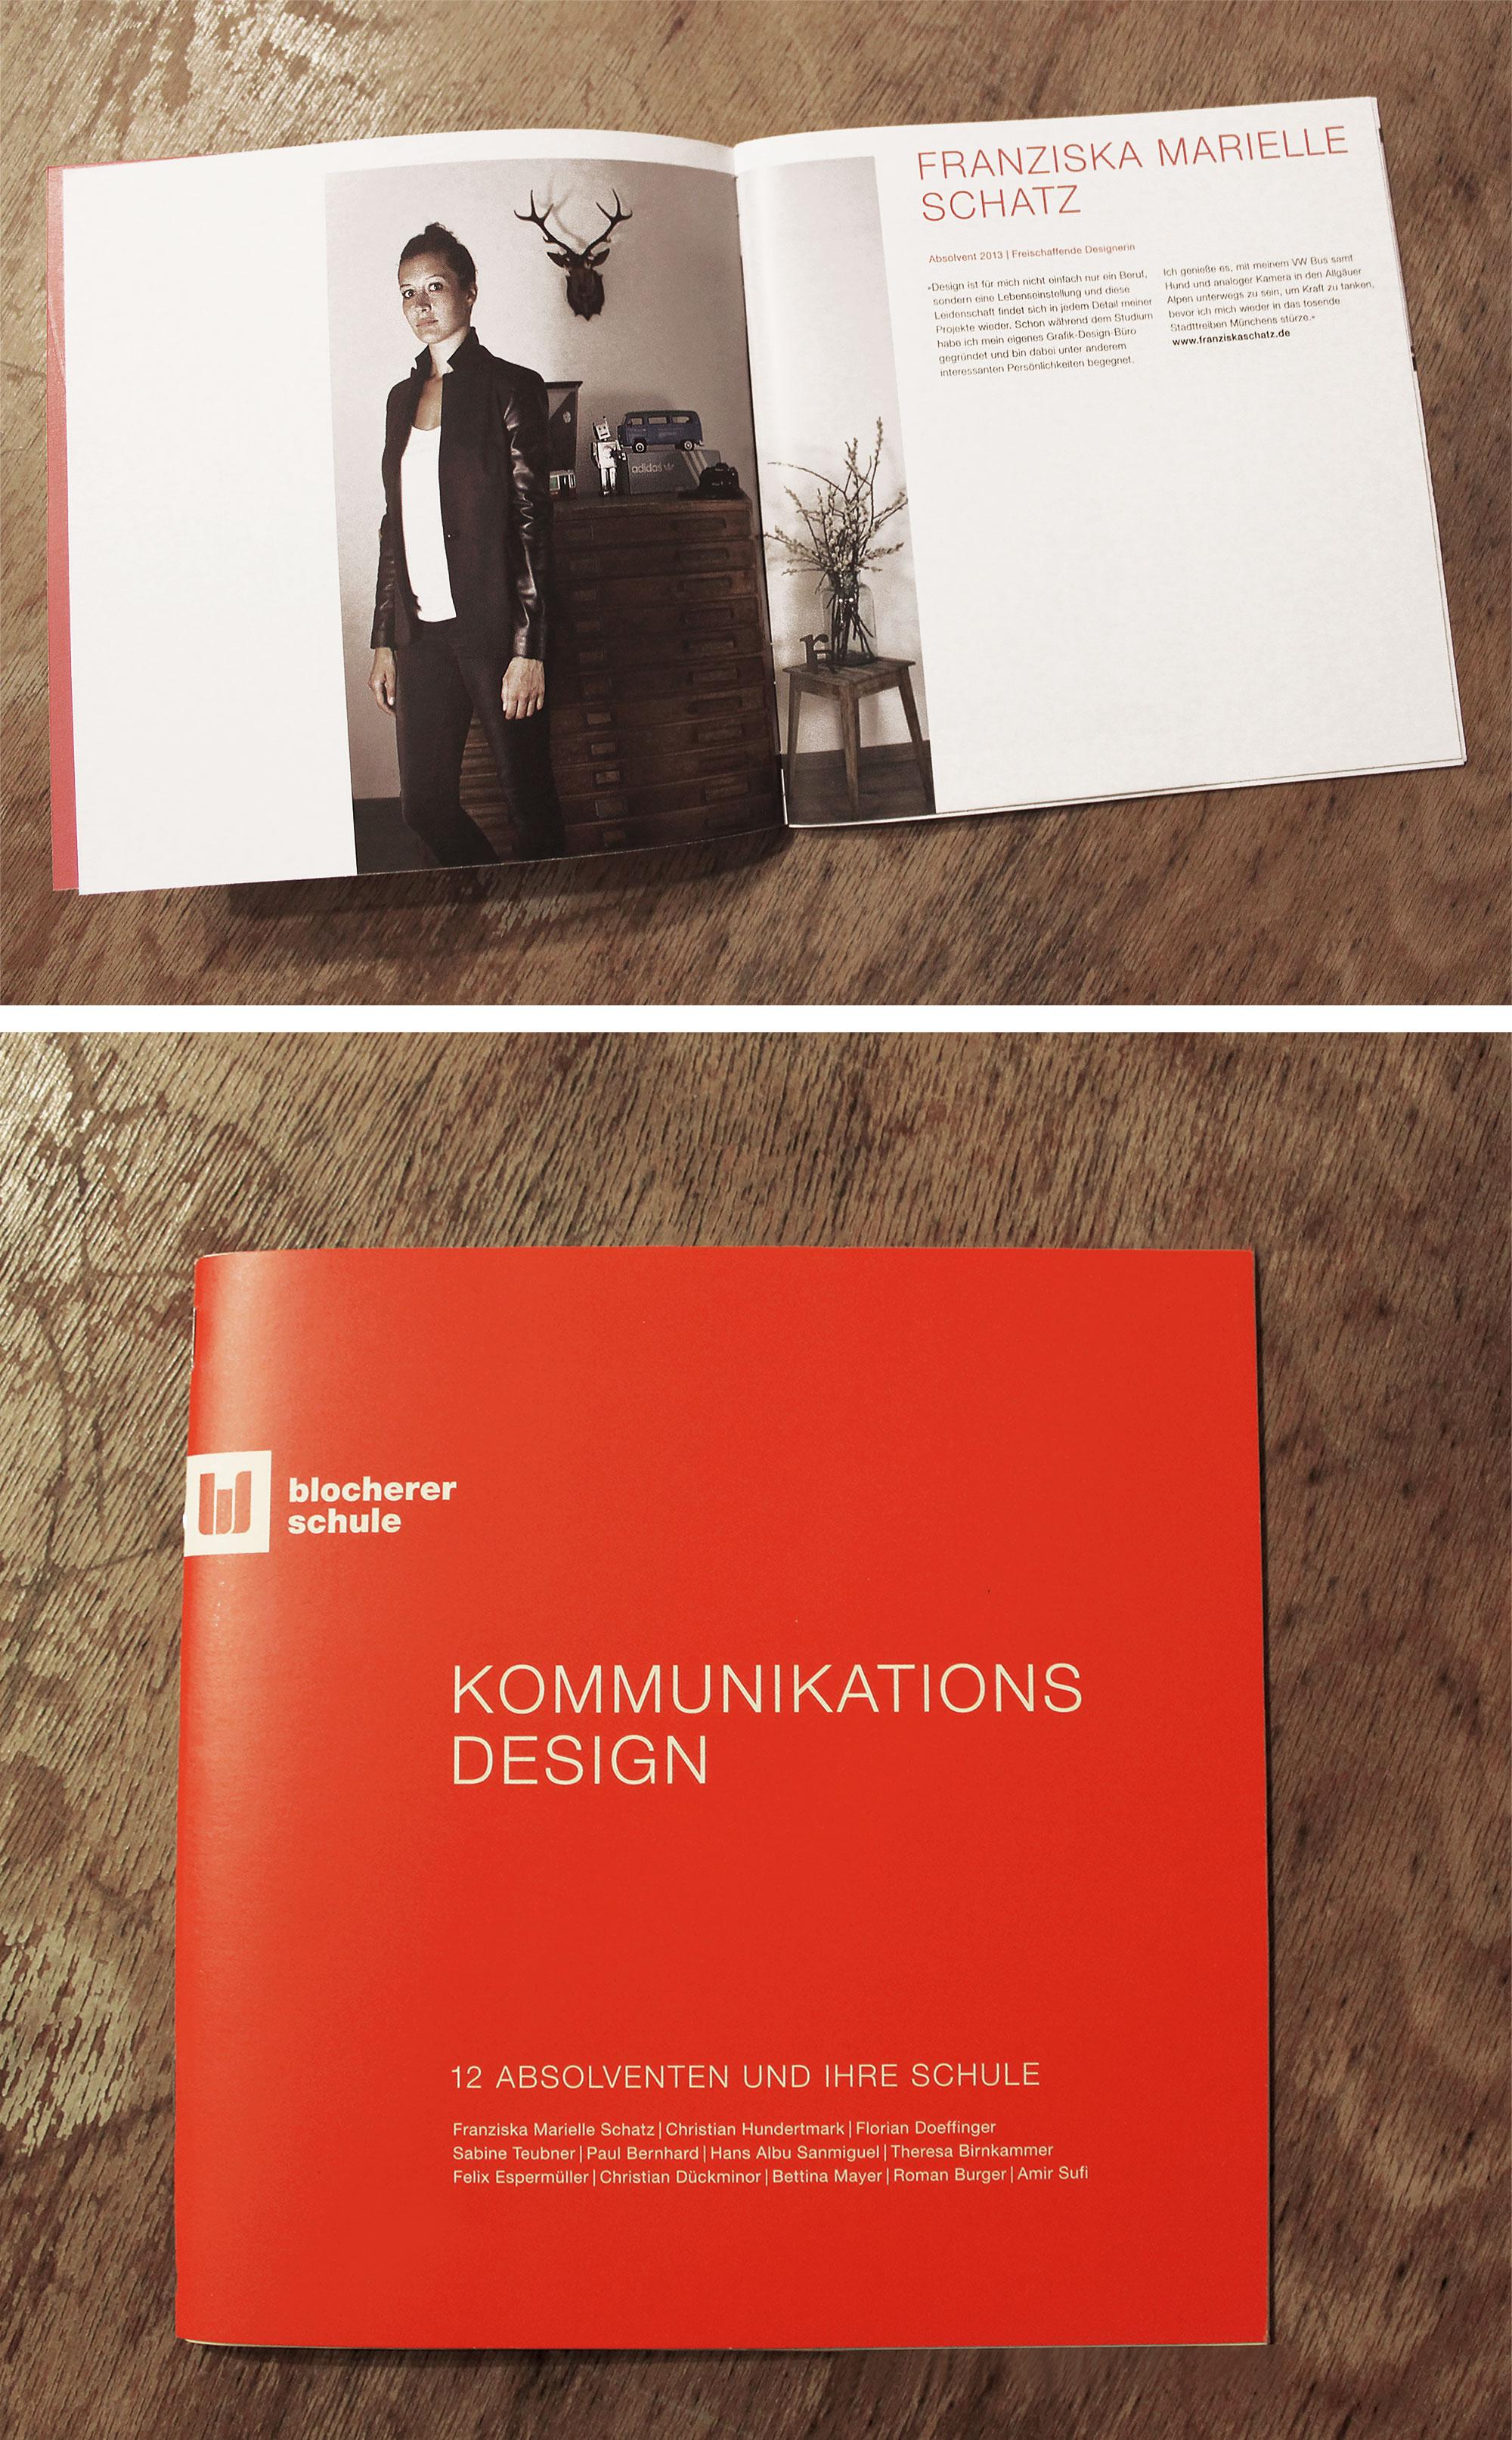 Franziska Schatz Grafik Design | Kommunikationsdesign | Editorial Design | Logo | Branding | Corporate Design | Identity | Werbung | Werbeagentur | Kaufbeuren | Allgäu